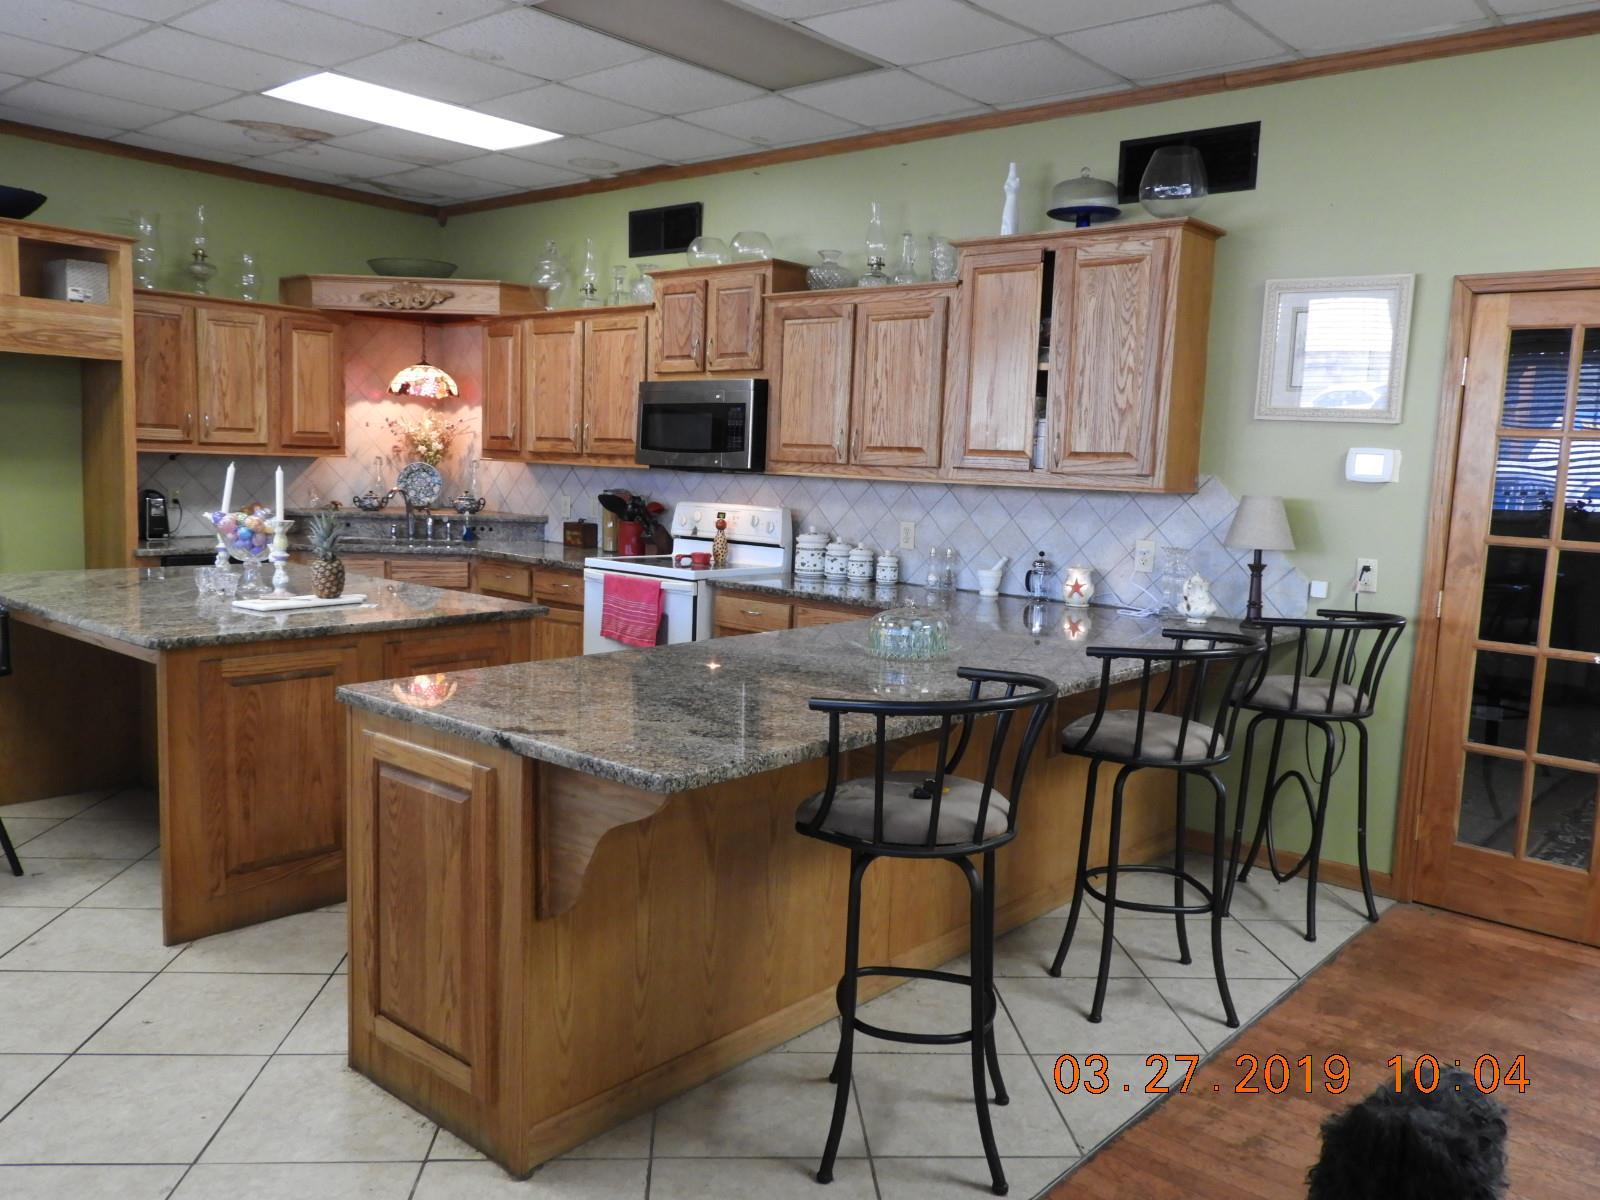 319 N 1St St Property Photo - Pulaski, TN real estate listing